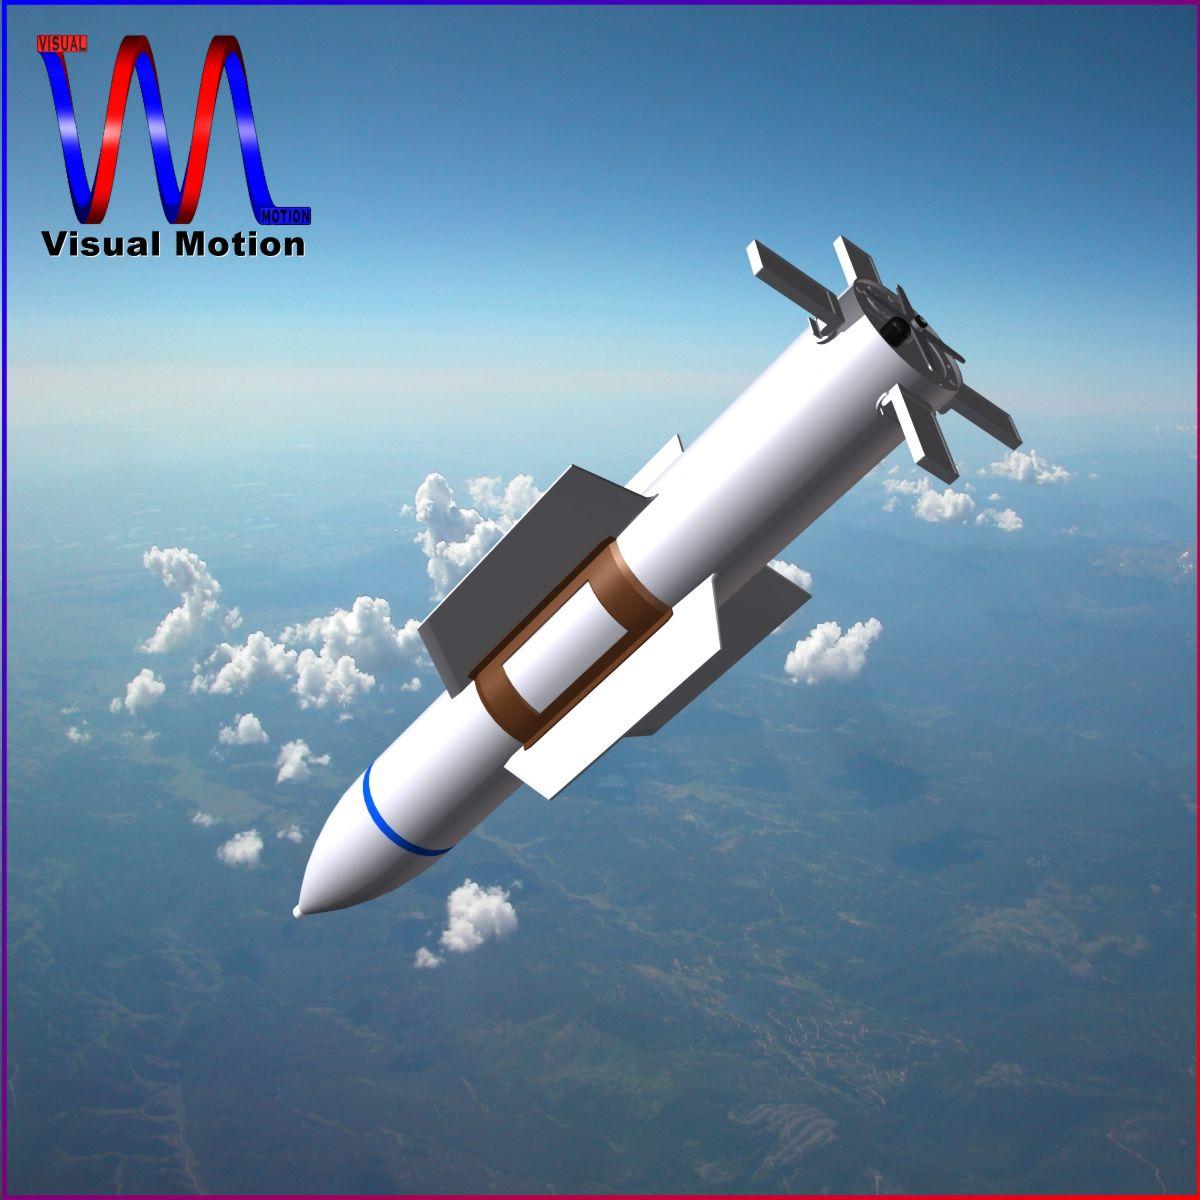 bomba usaf gbu-57 3d model 3ds dxf cob x obj 152696